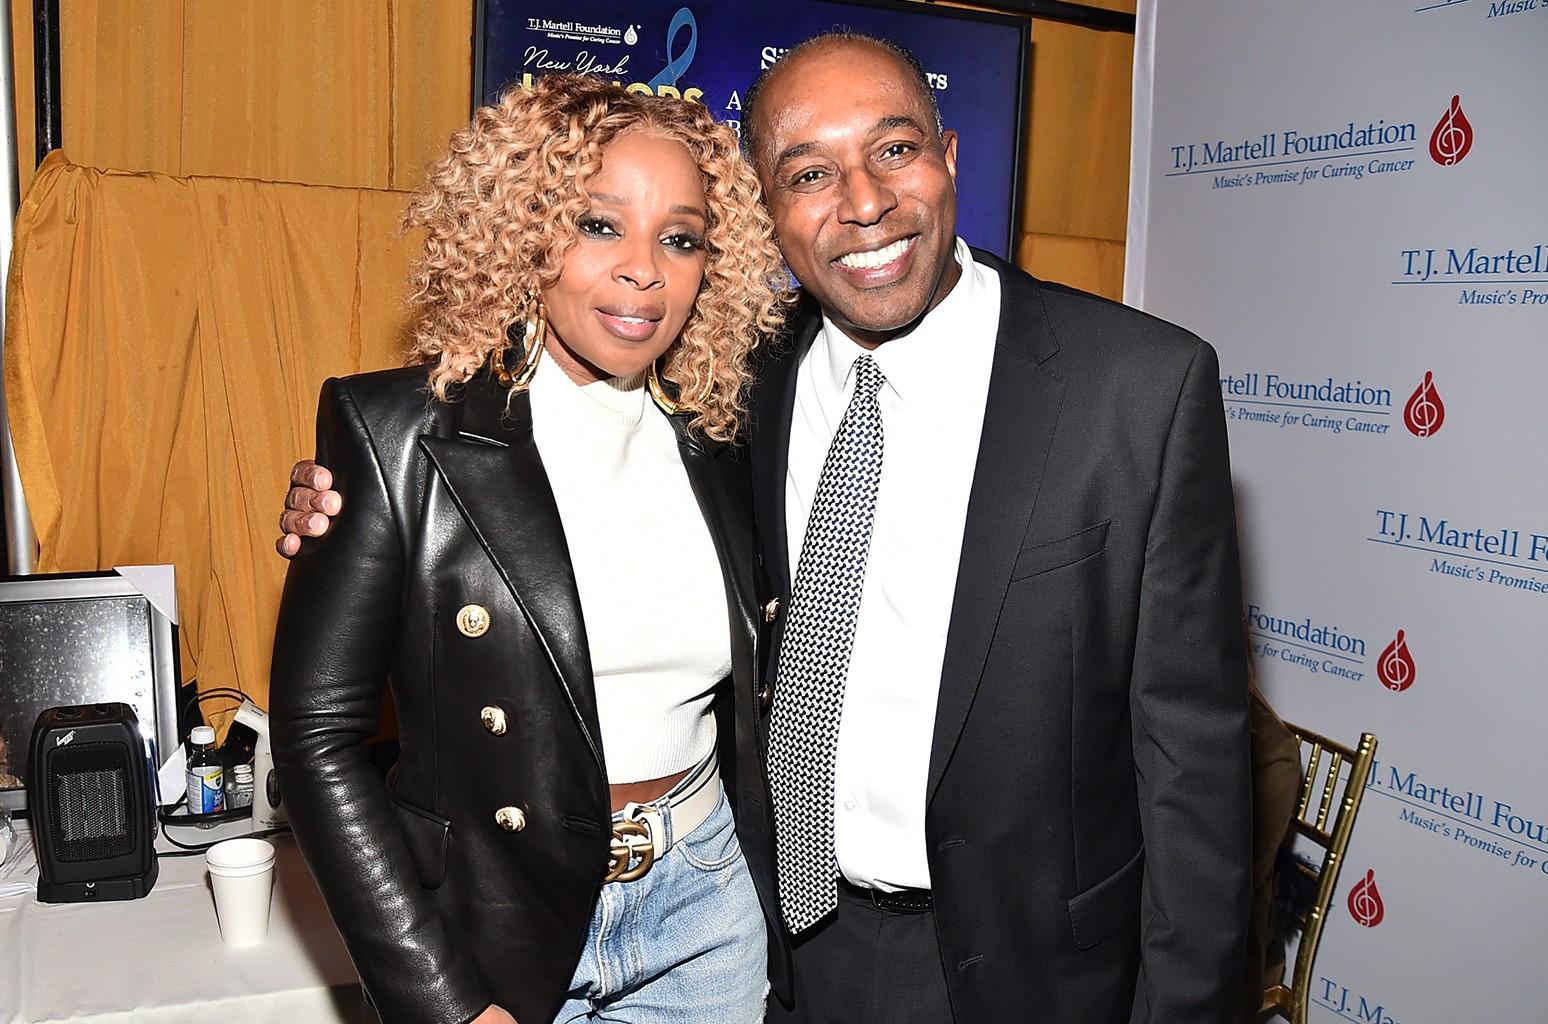 Mary J. Blige and Honoree Jeffrey Harleston